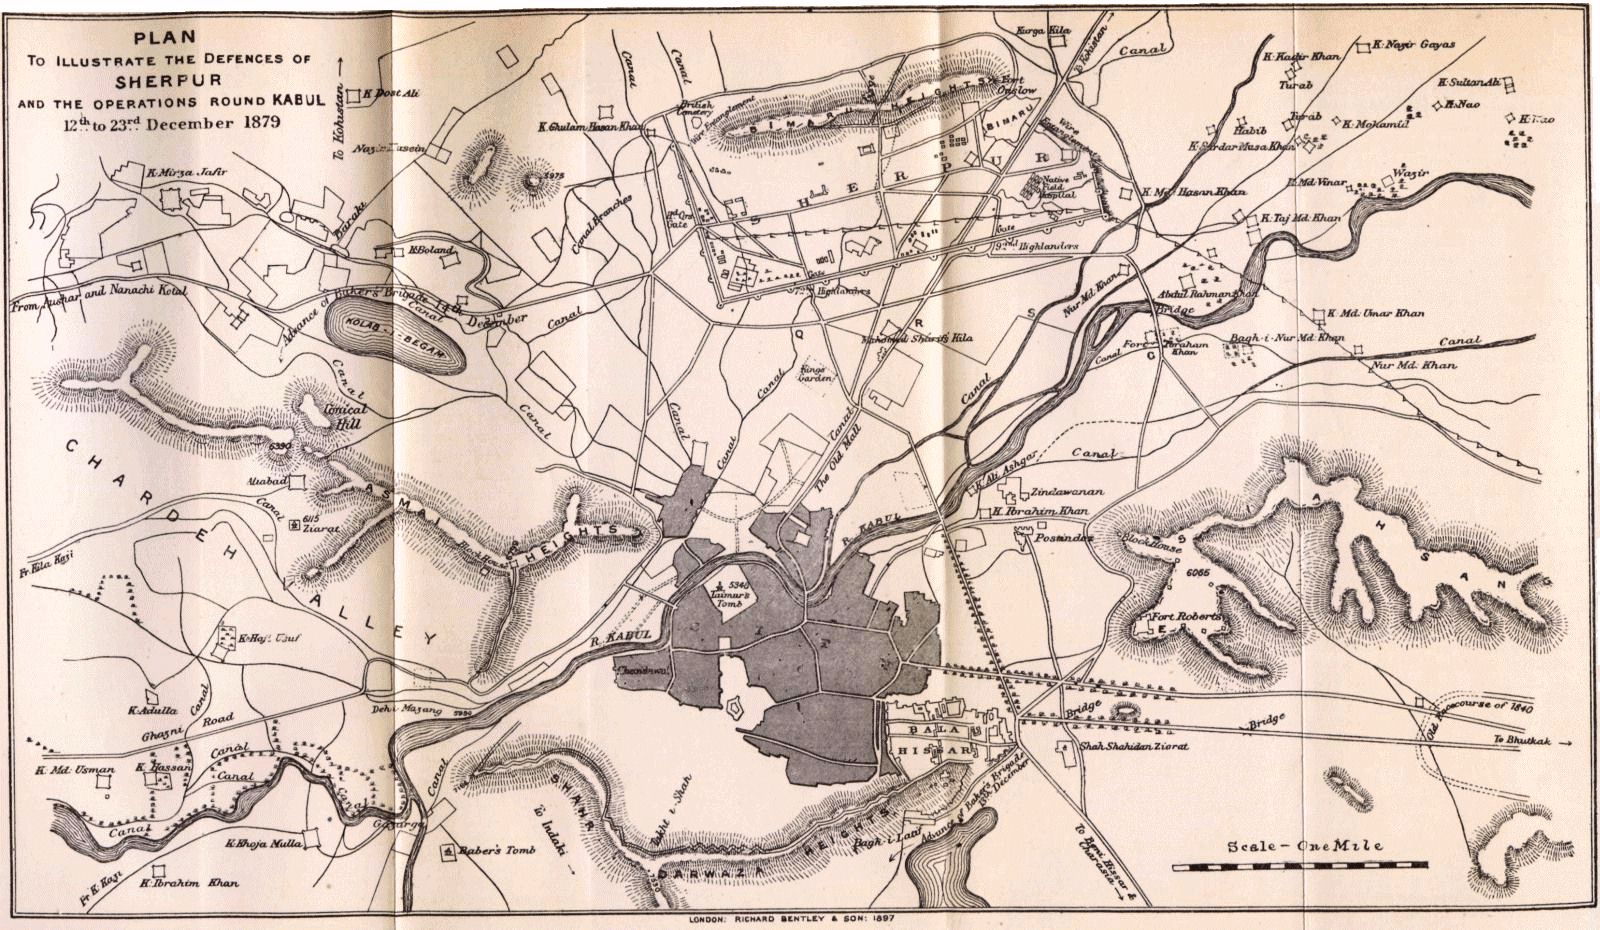 map7defencessherpurkabul-1600